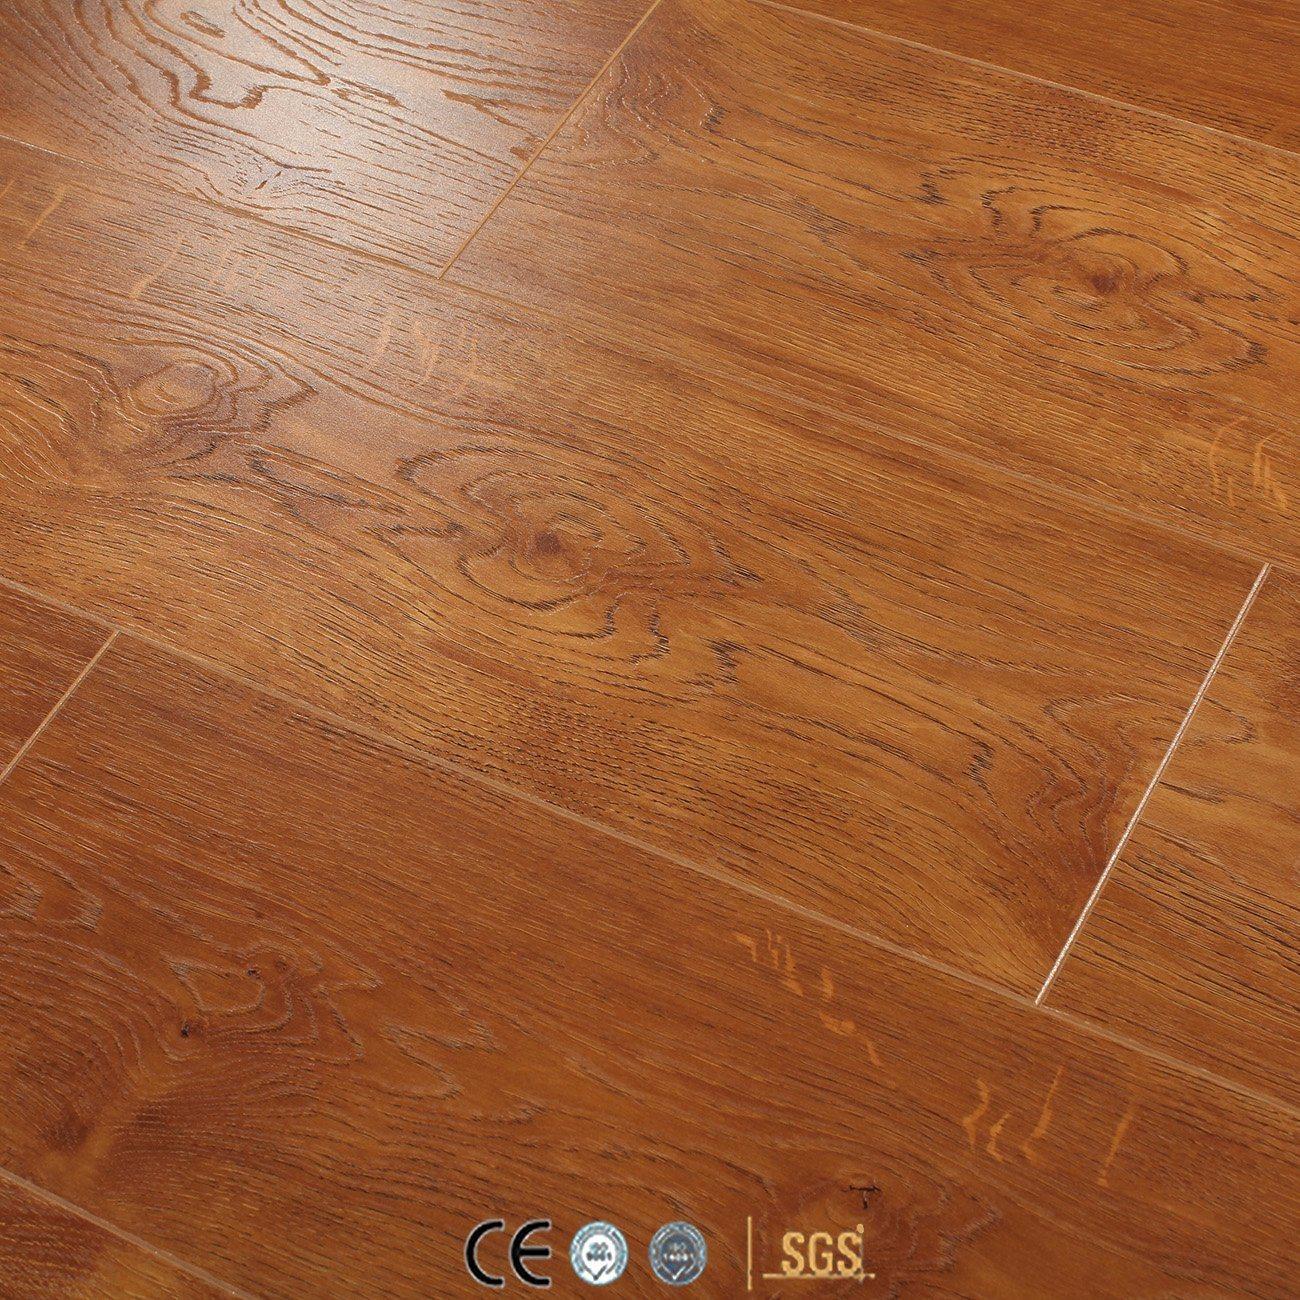 China 12mm Eir Oak Ac4 E1 Hdf Wood Wooden Vinyl Laminate Laminated Flooring Floor